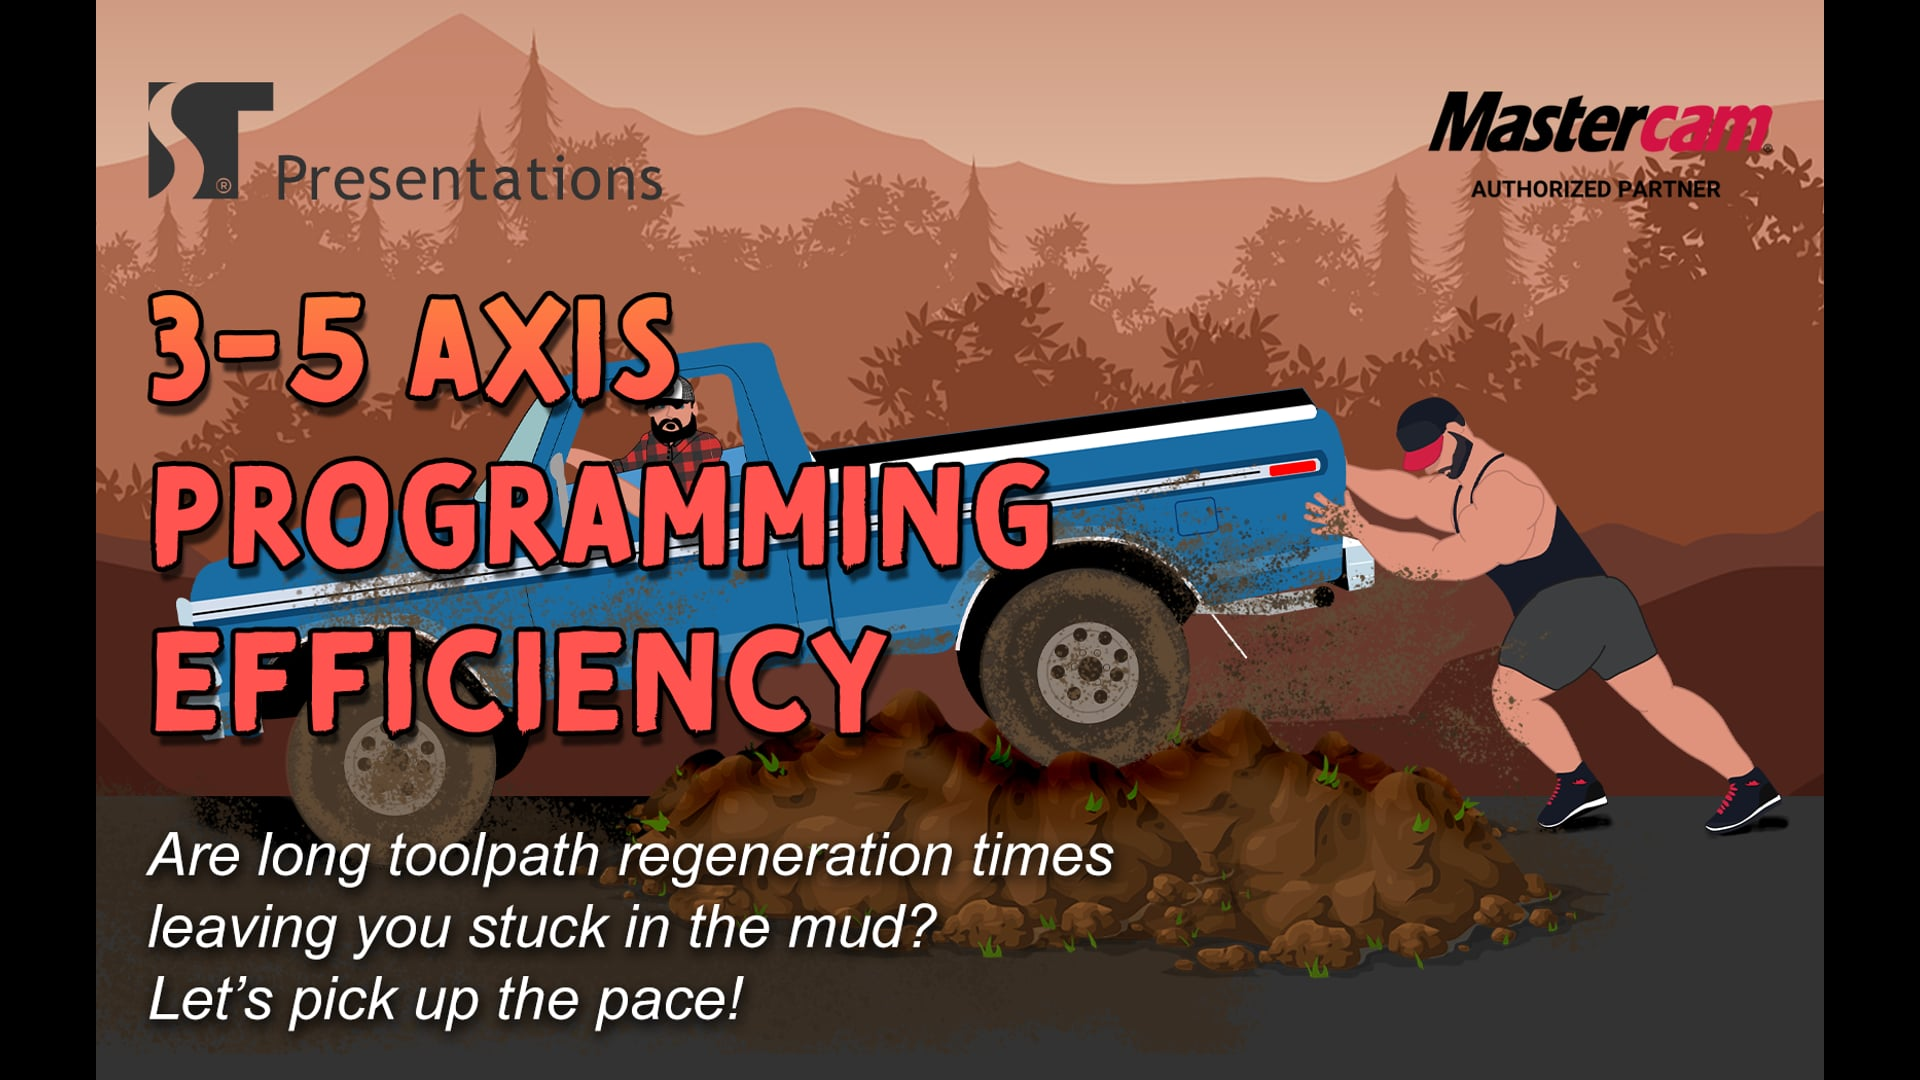 3-5 Axis Programming Efficiency